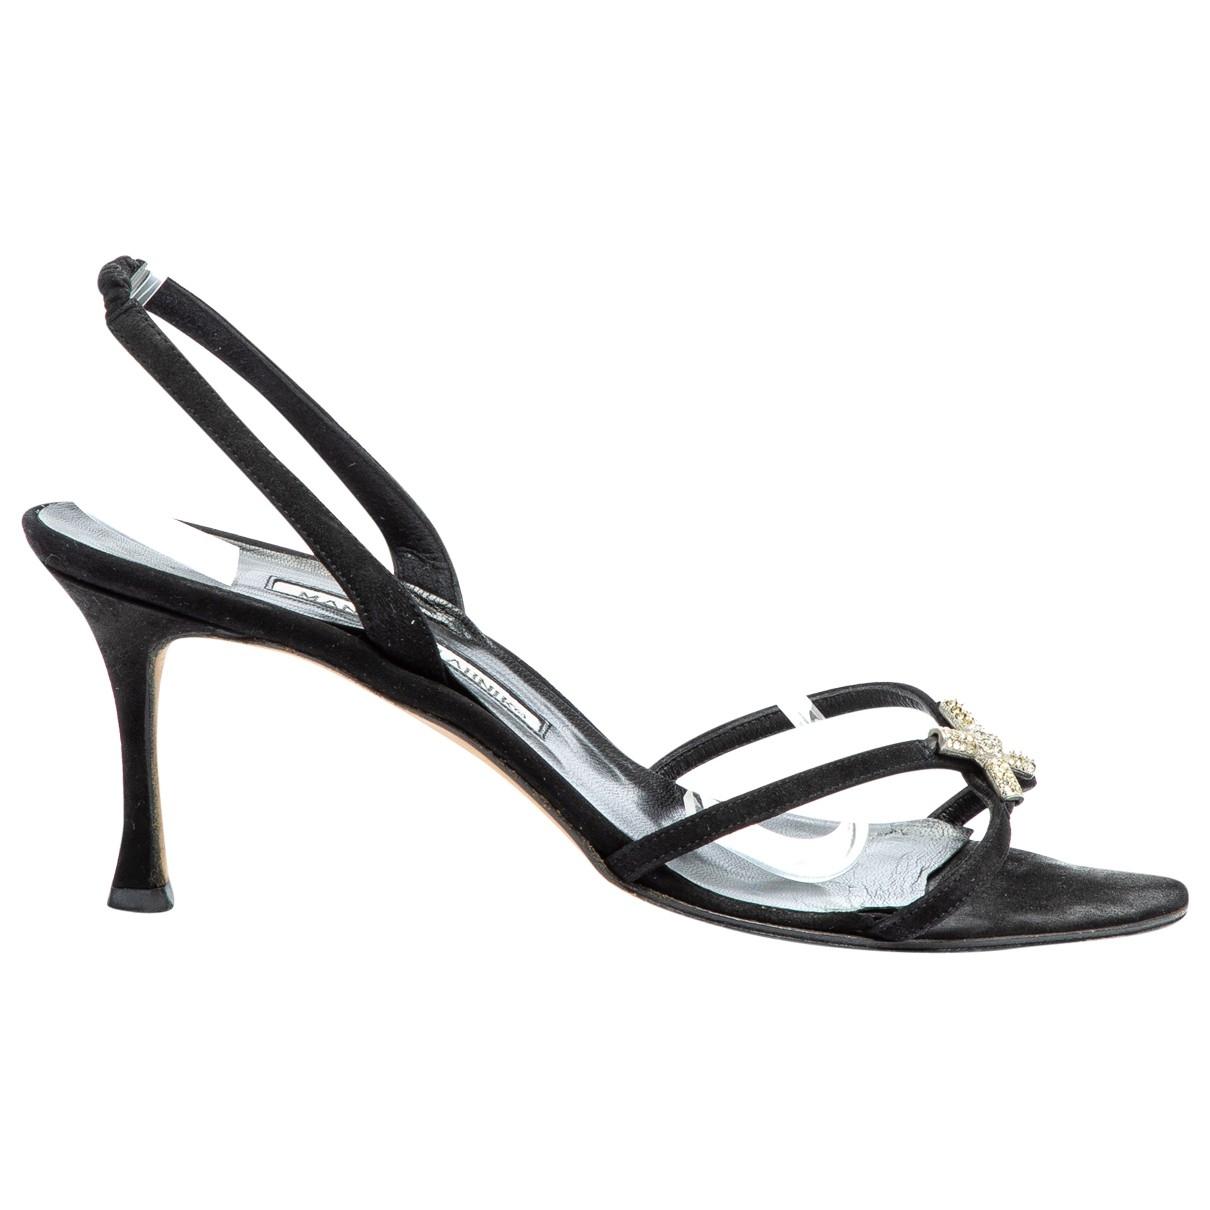 Manolo Blahnik \N Black Leather Sandals for Women 39 EU